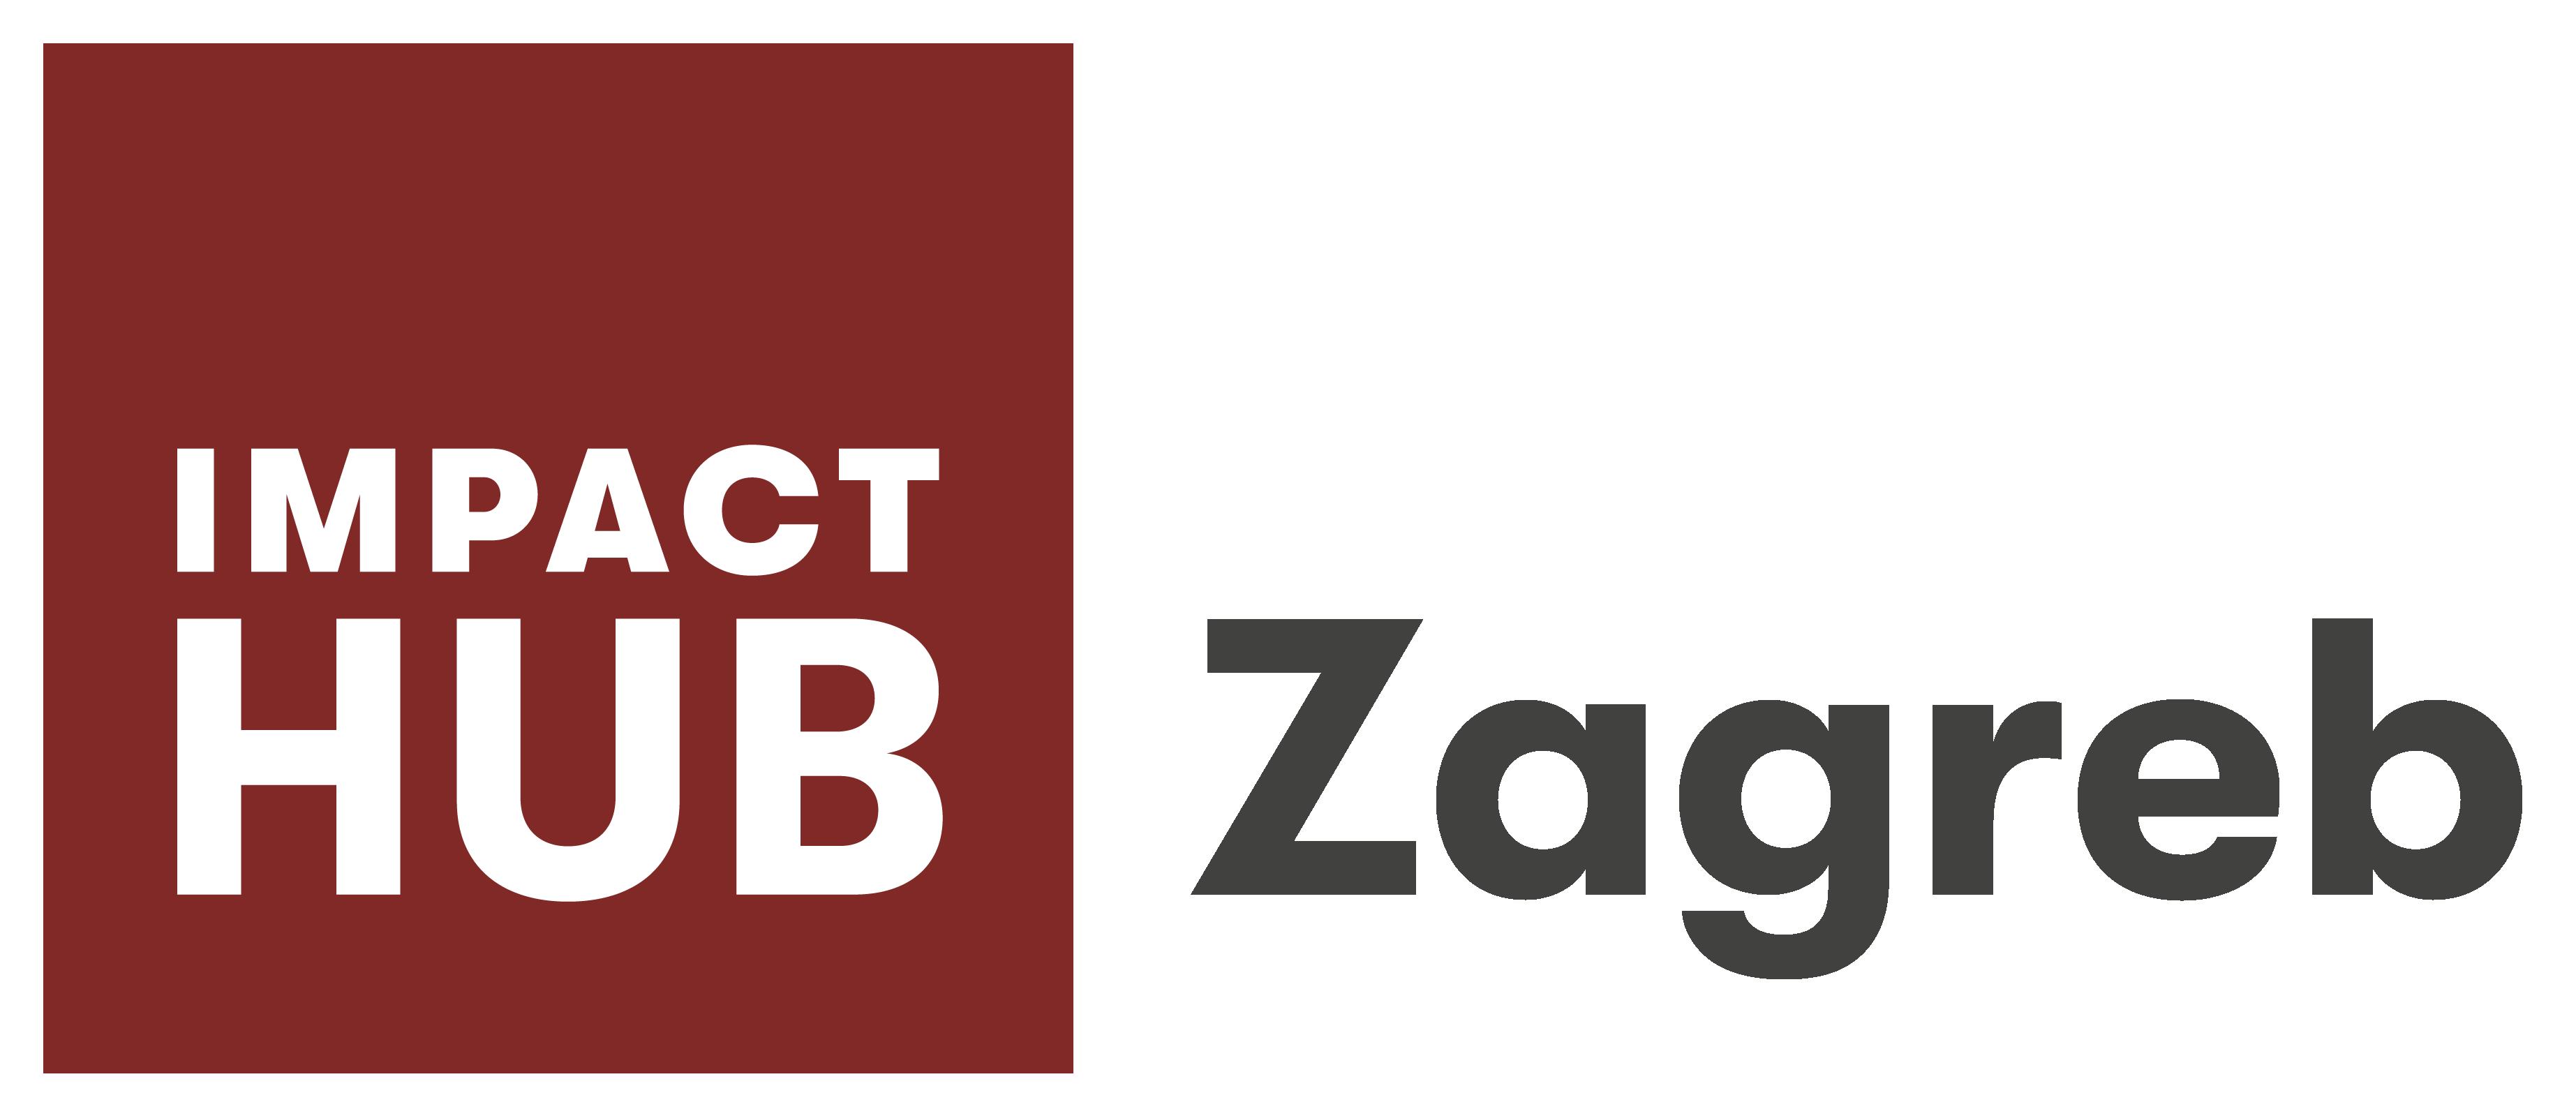 ImpactHub Zagreb